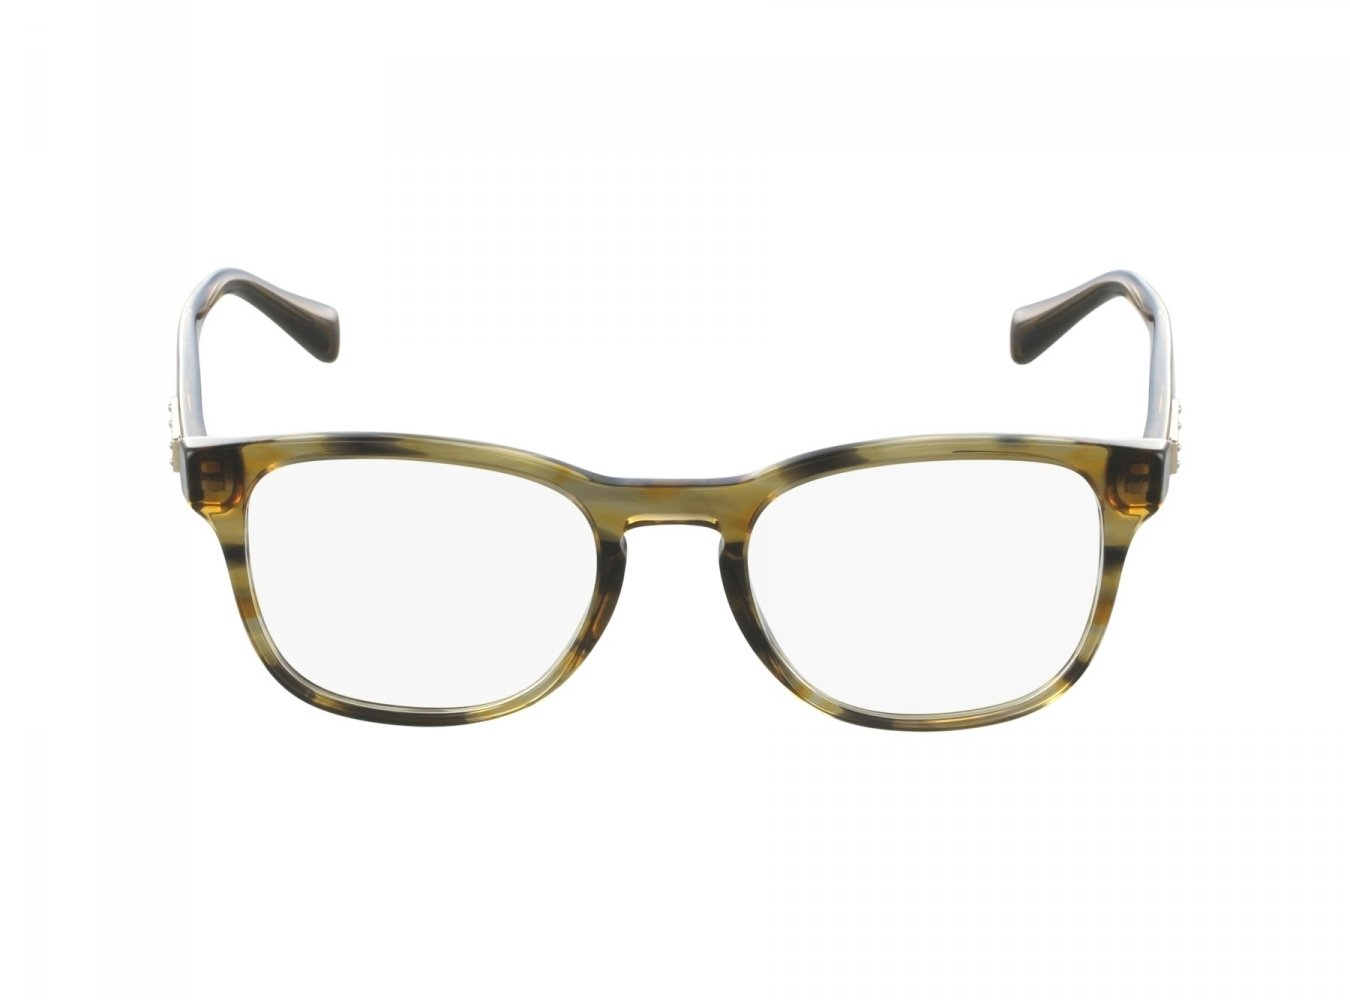 Dolce&Gabbana DG3260 Eyeglass Frames 3063-52 - Striped Brown DG3260-3063-52